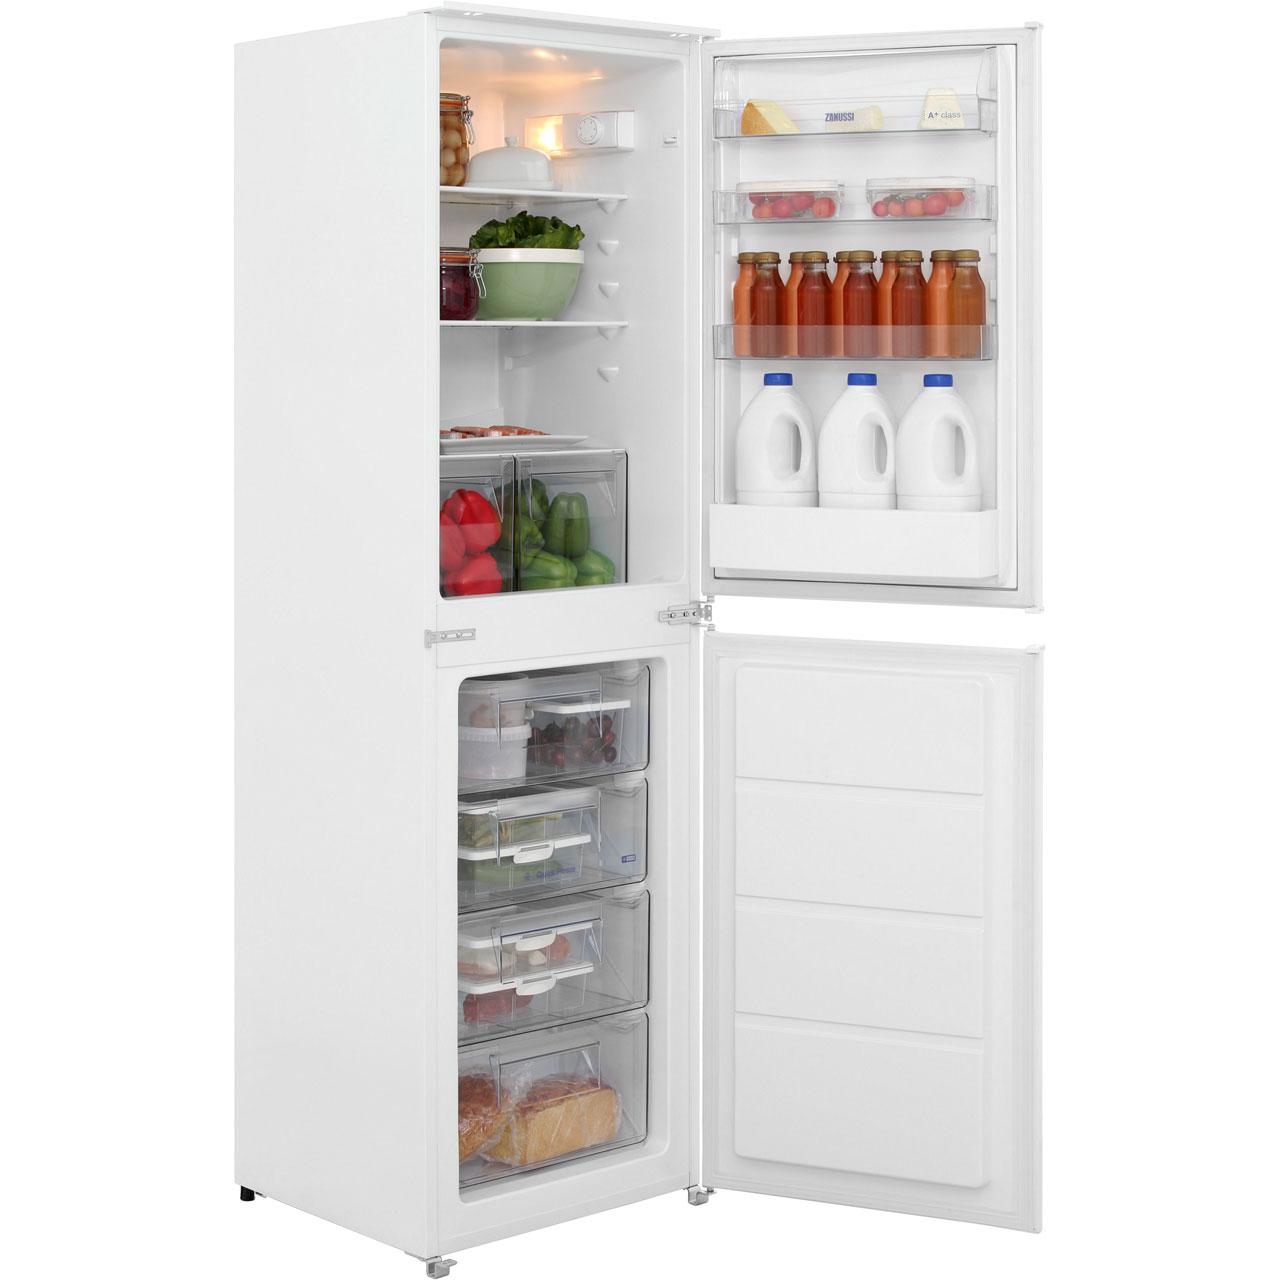 buy cheap zanussi integrated fridge freezer compare. Black Bedroom Furniture Sets. Home Design Ideas